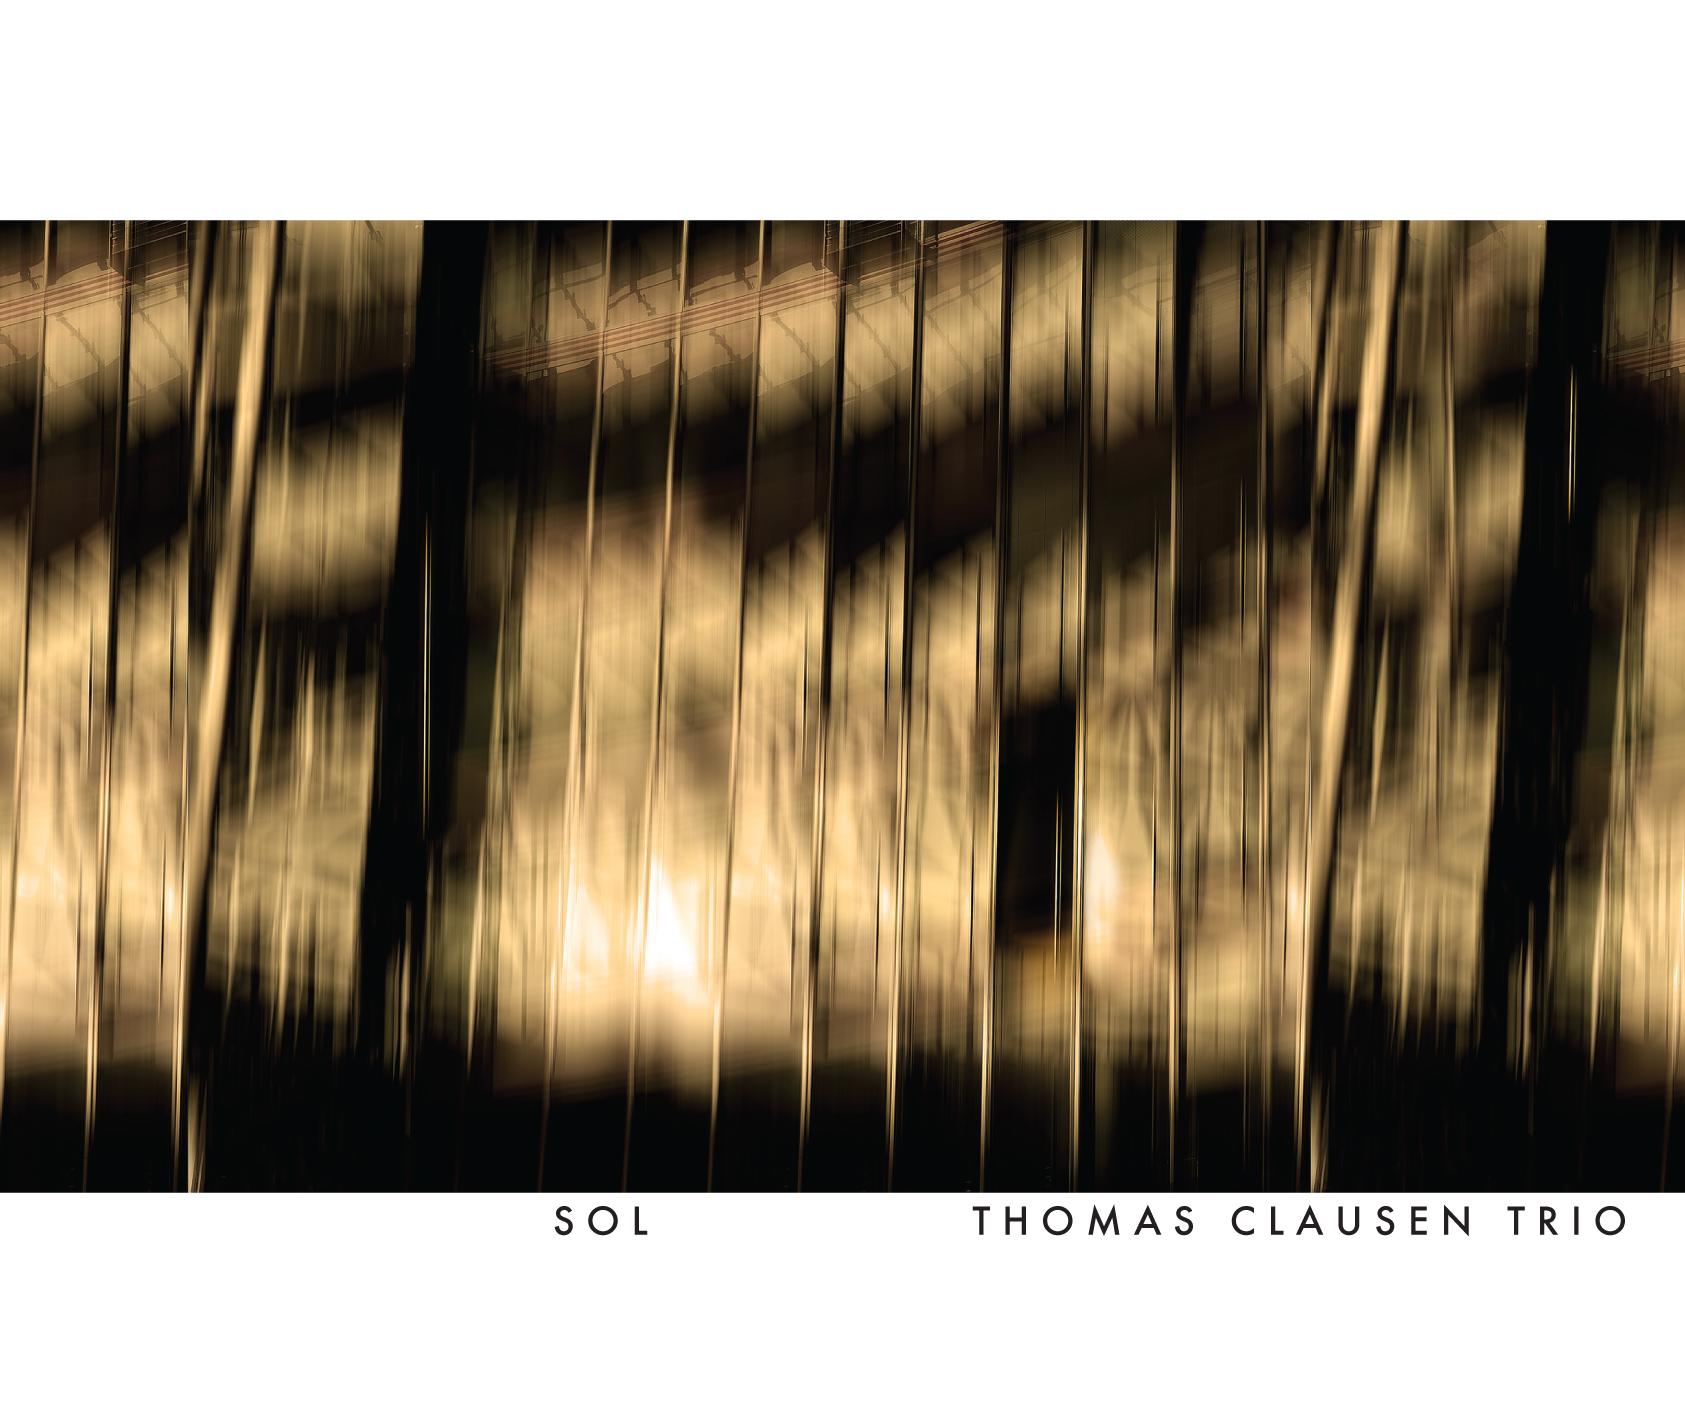 Artists Releases Thomas Clausen Trio Sol